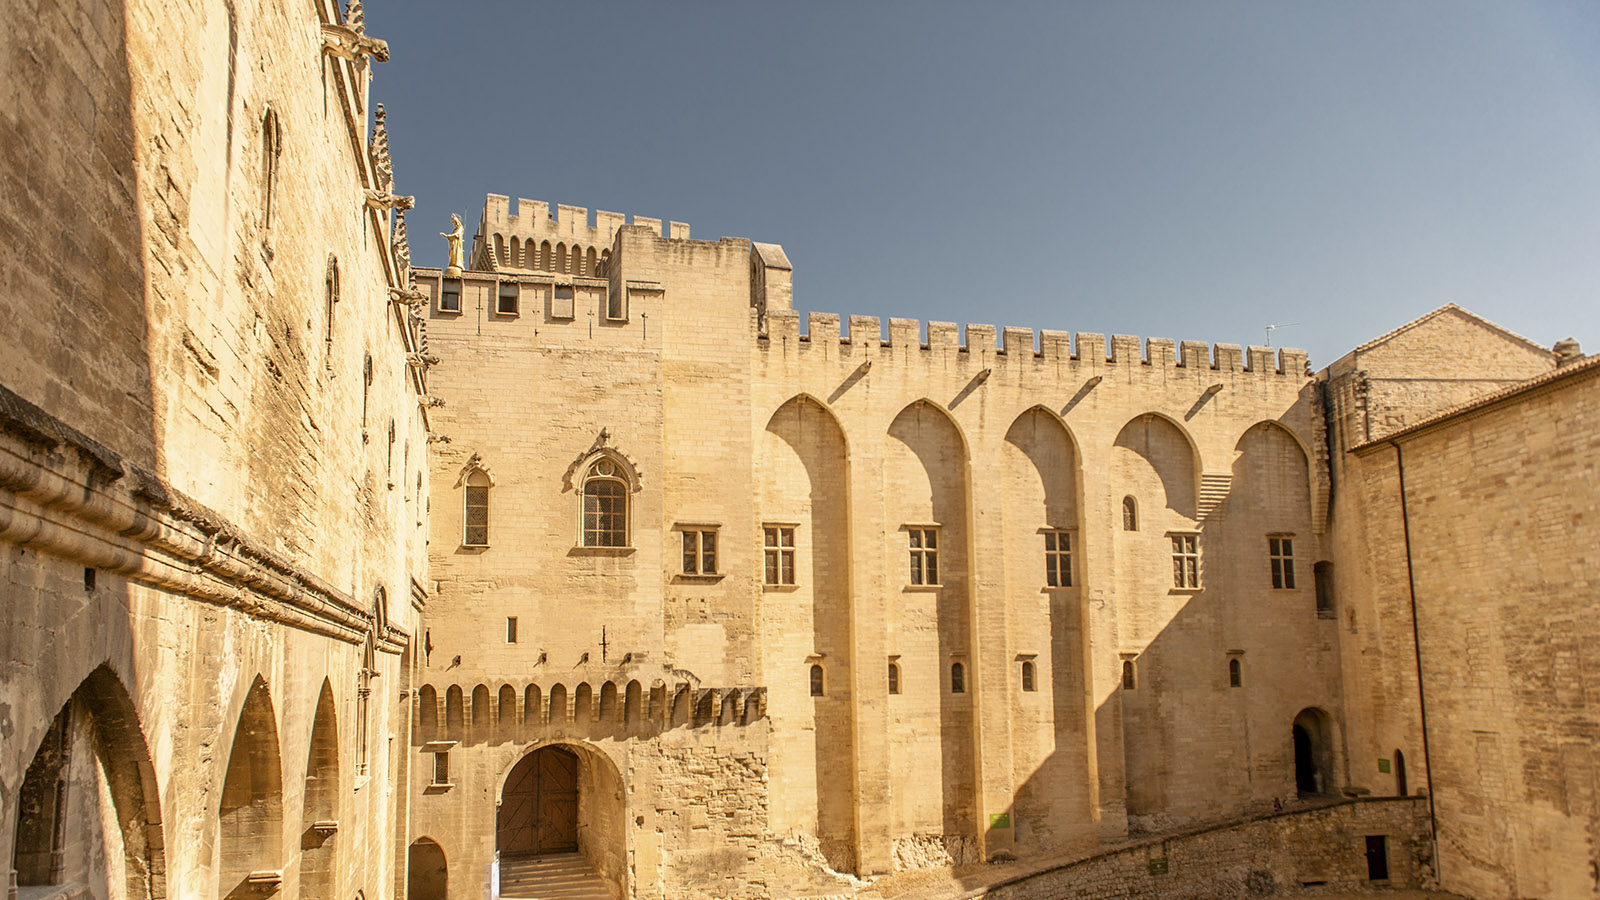 Der Innenhof des Palais des Papes von Avignon. Foto: Hilke Maunder